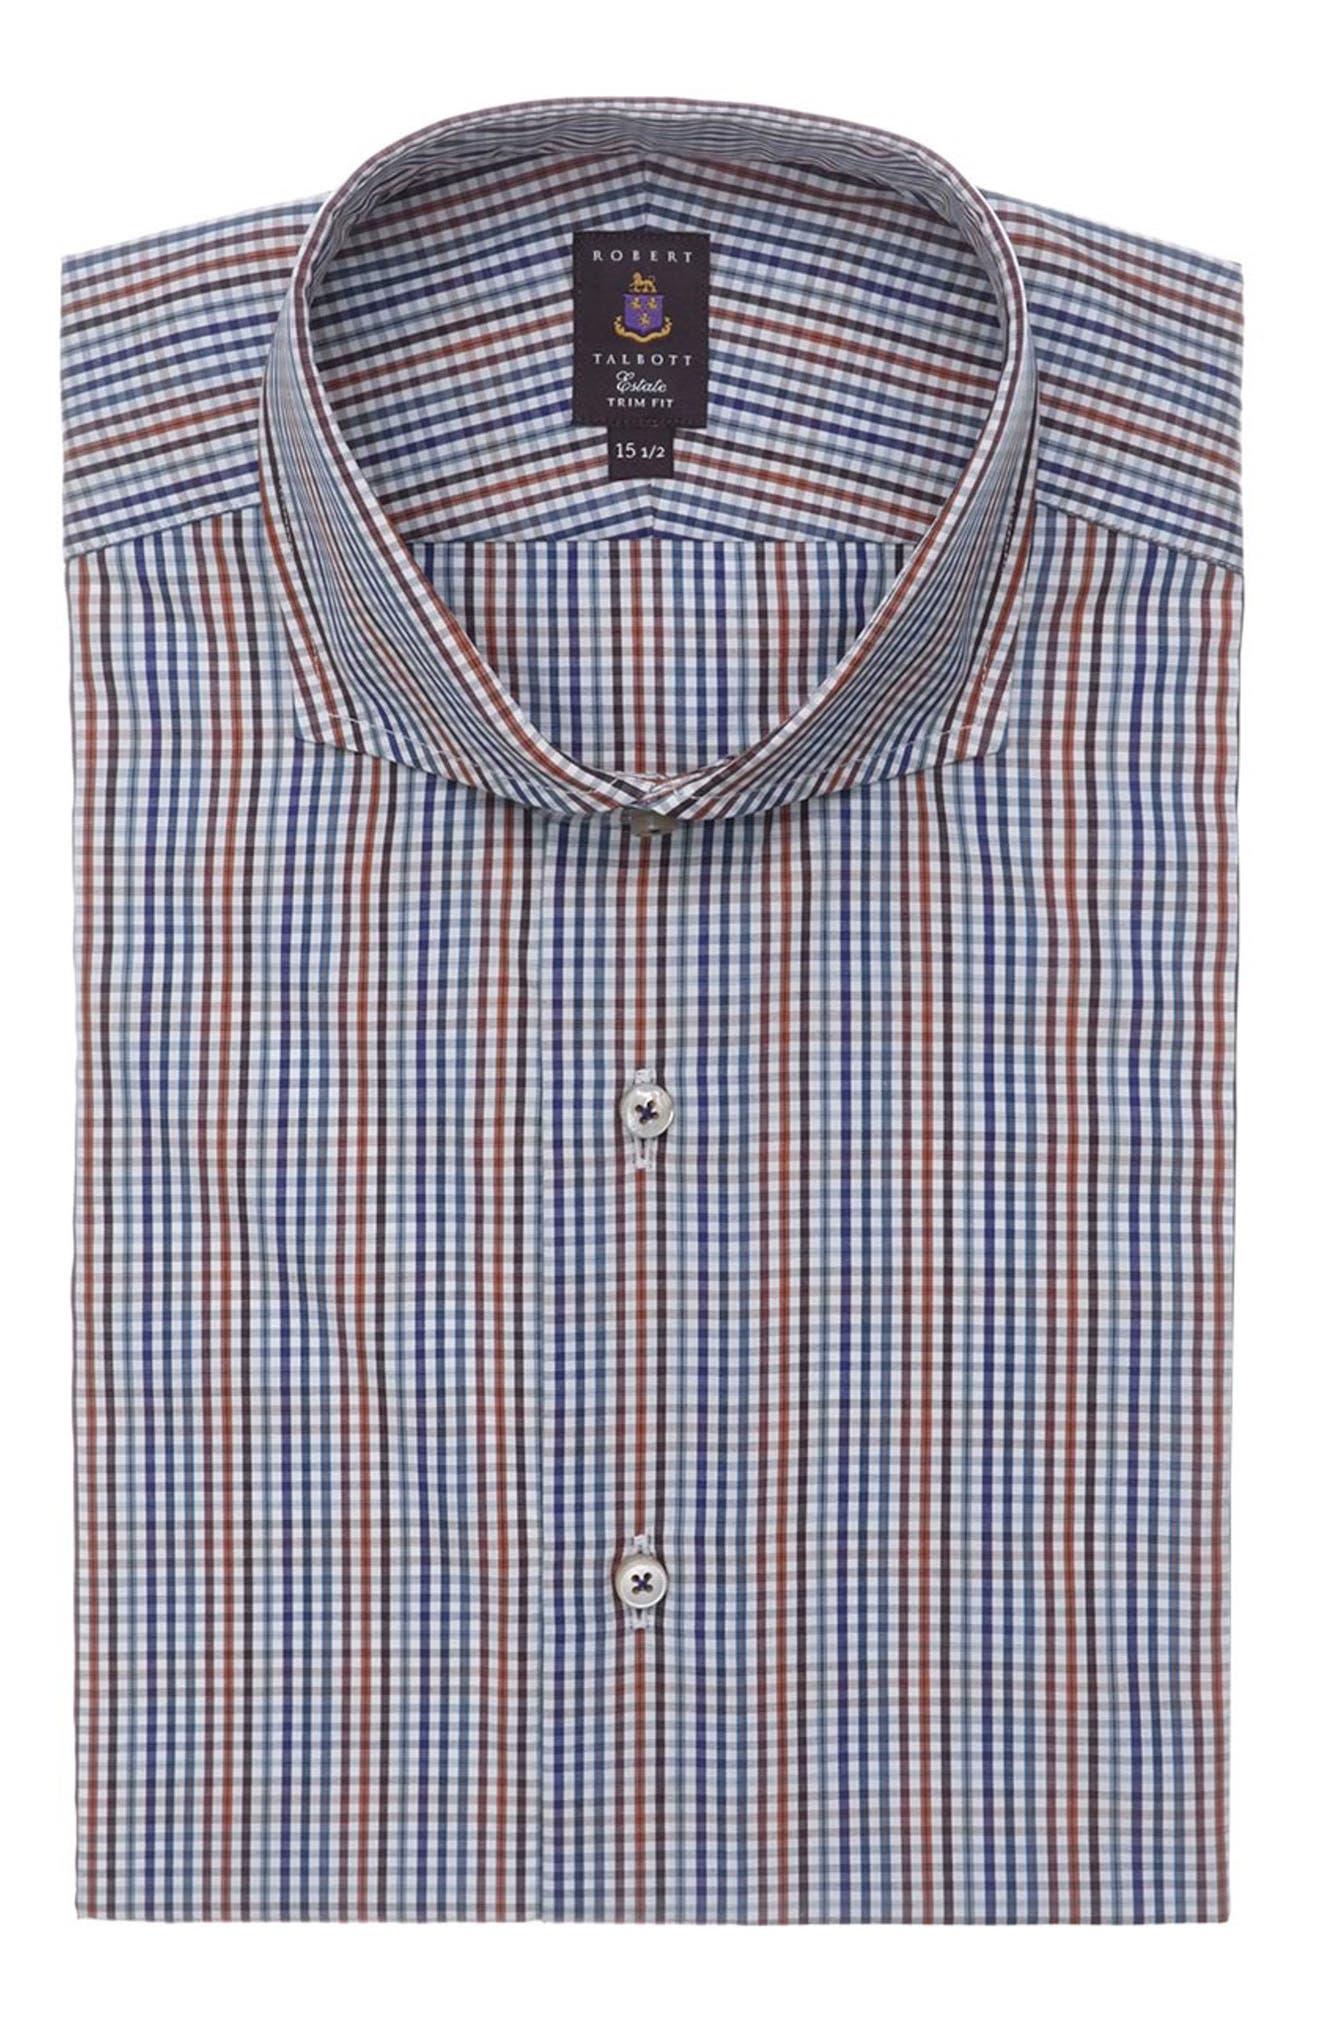 Tailored Fit Check Dress Shirt,                             Main thumbnail 1, color,                             405